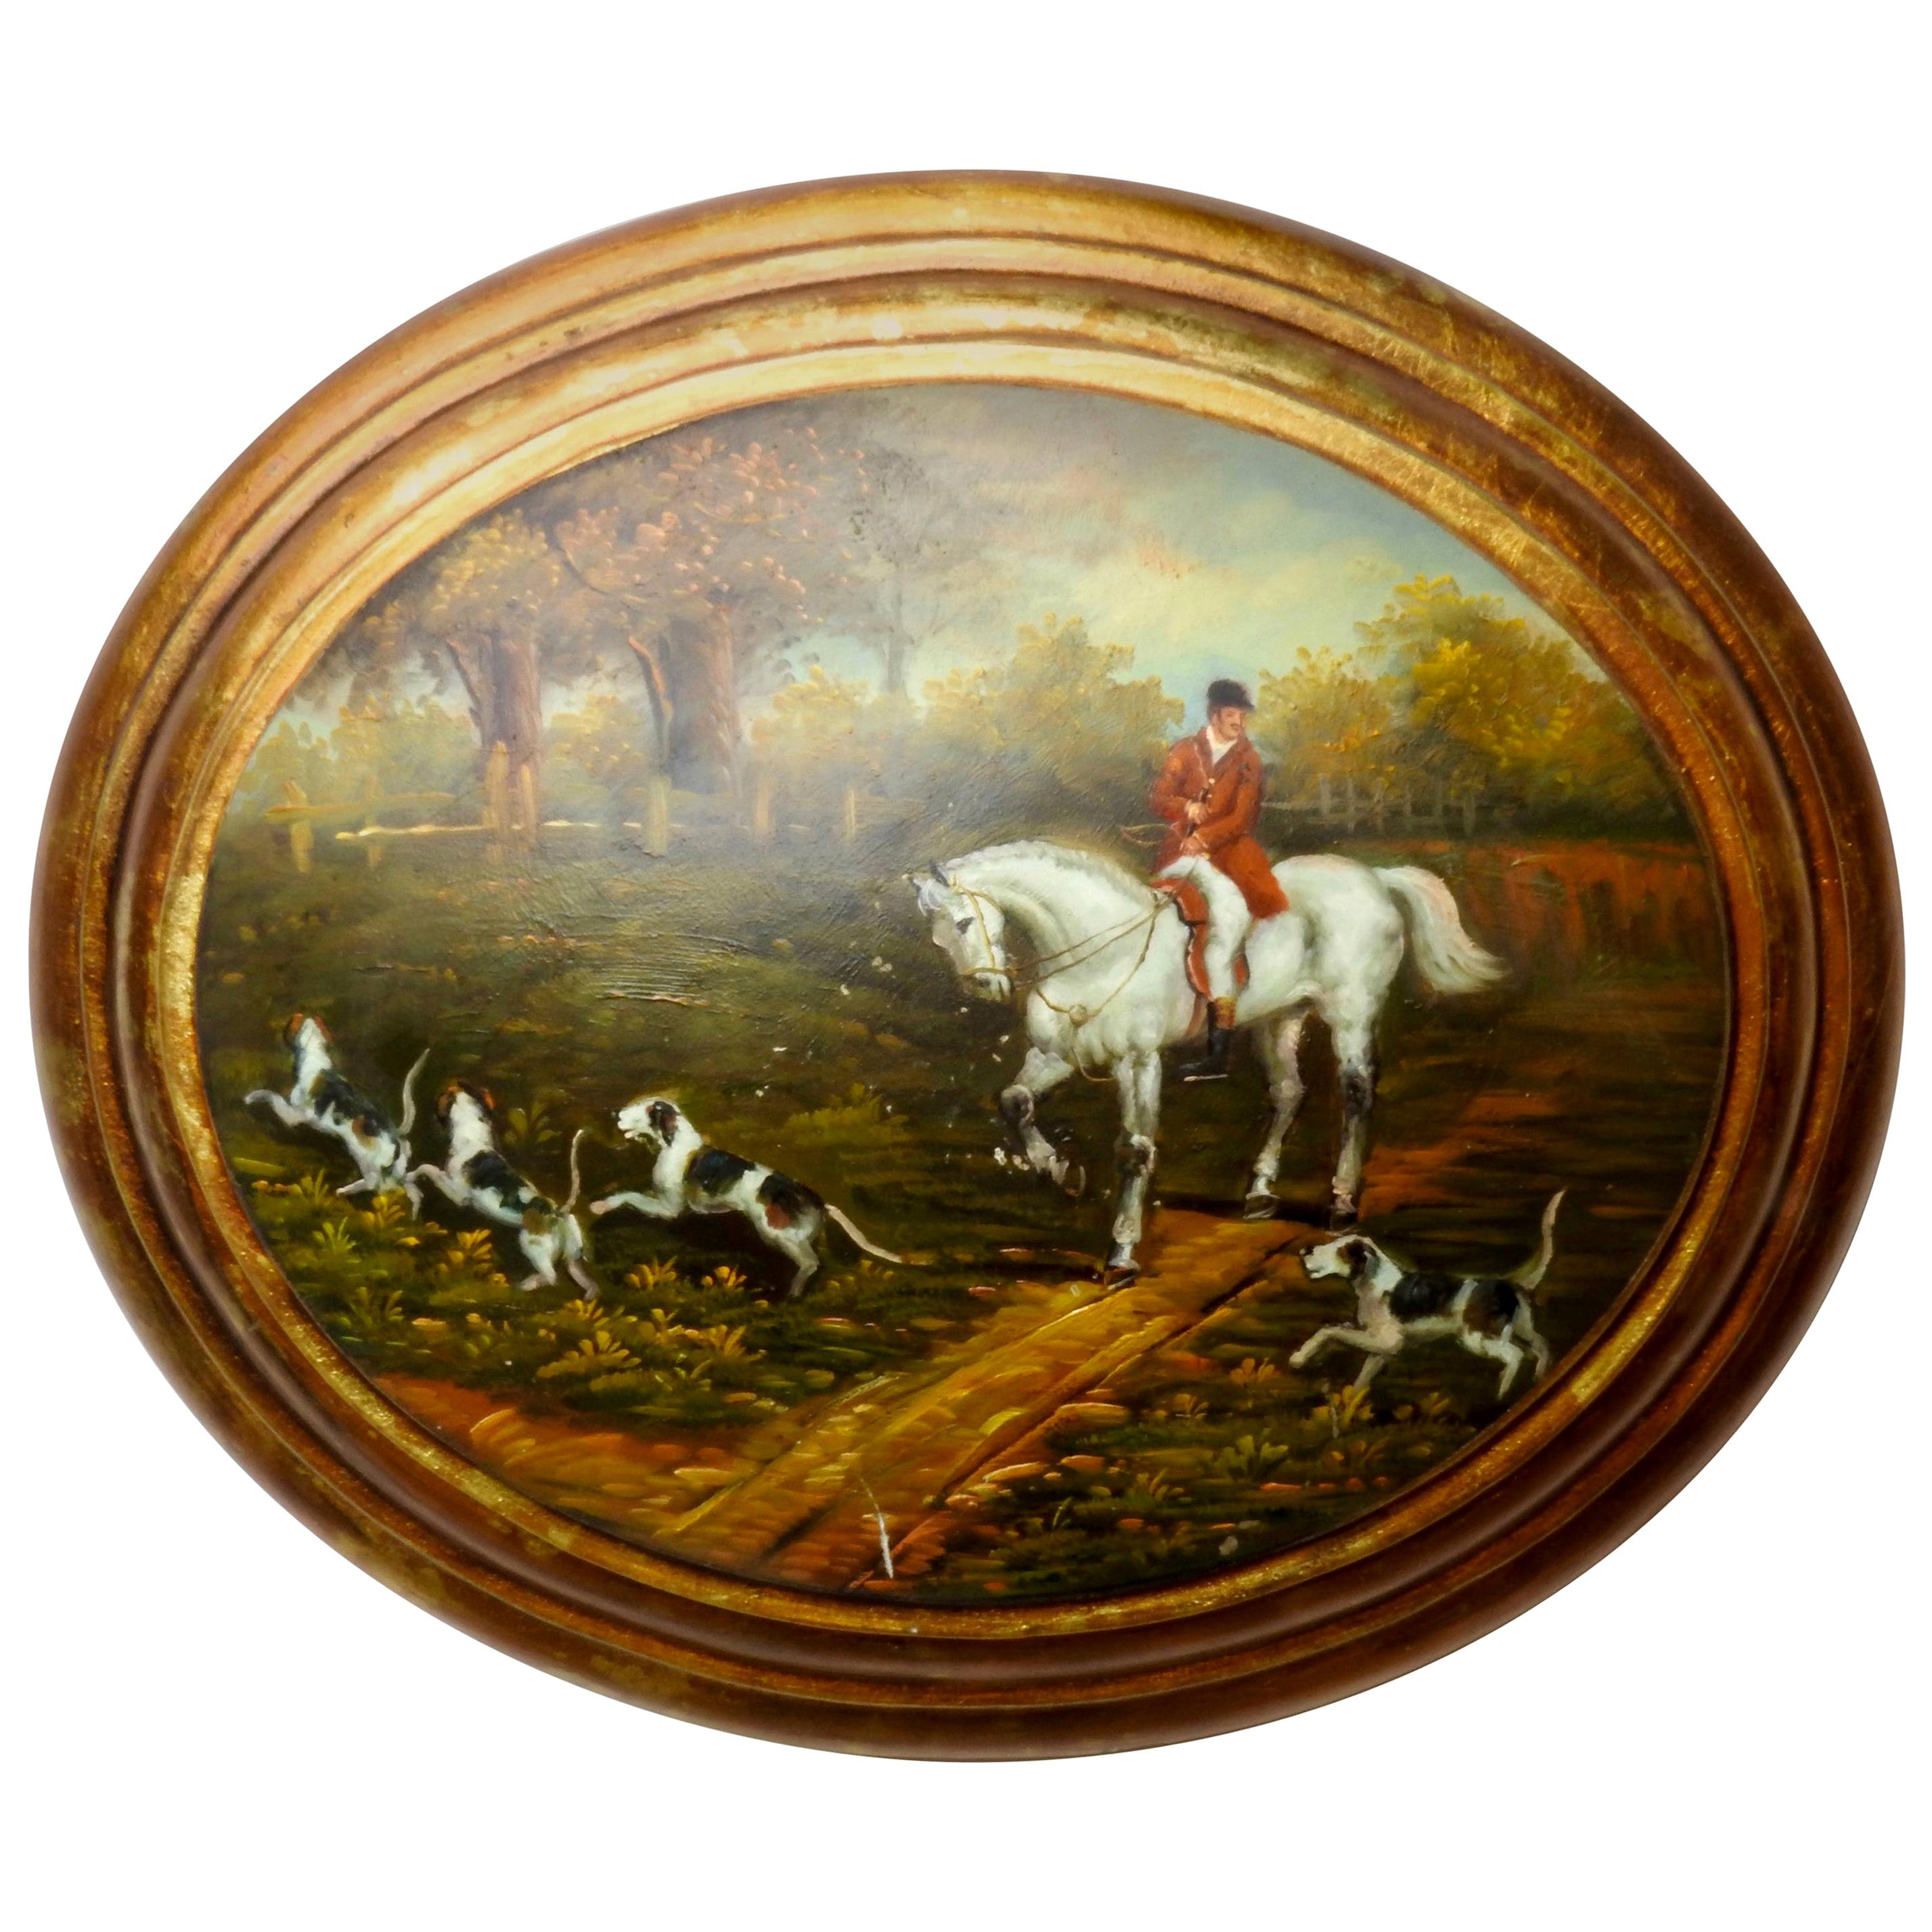 Oil on Wood English Hunt Scene, 19th Century